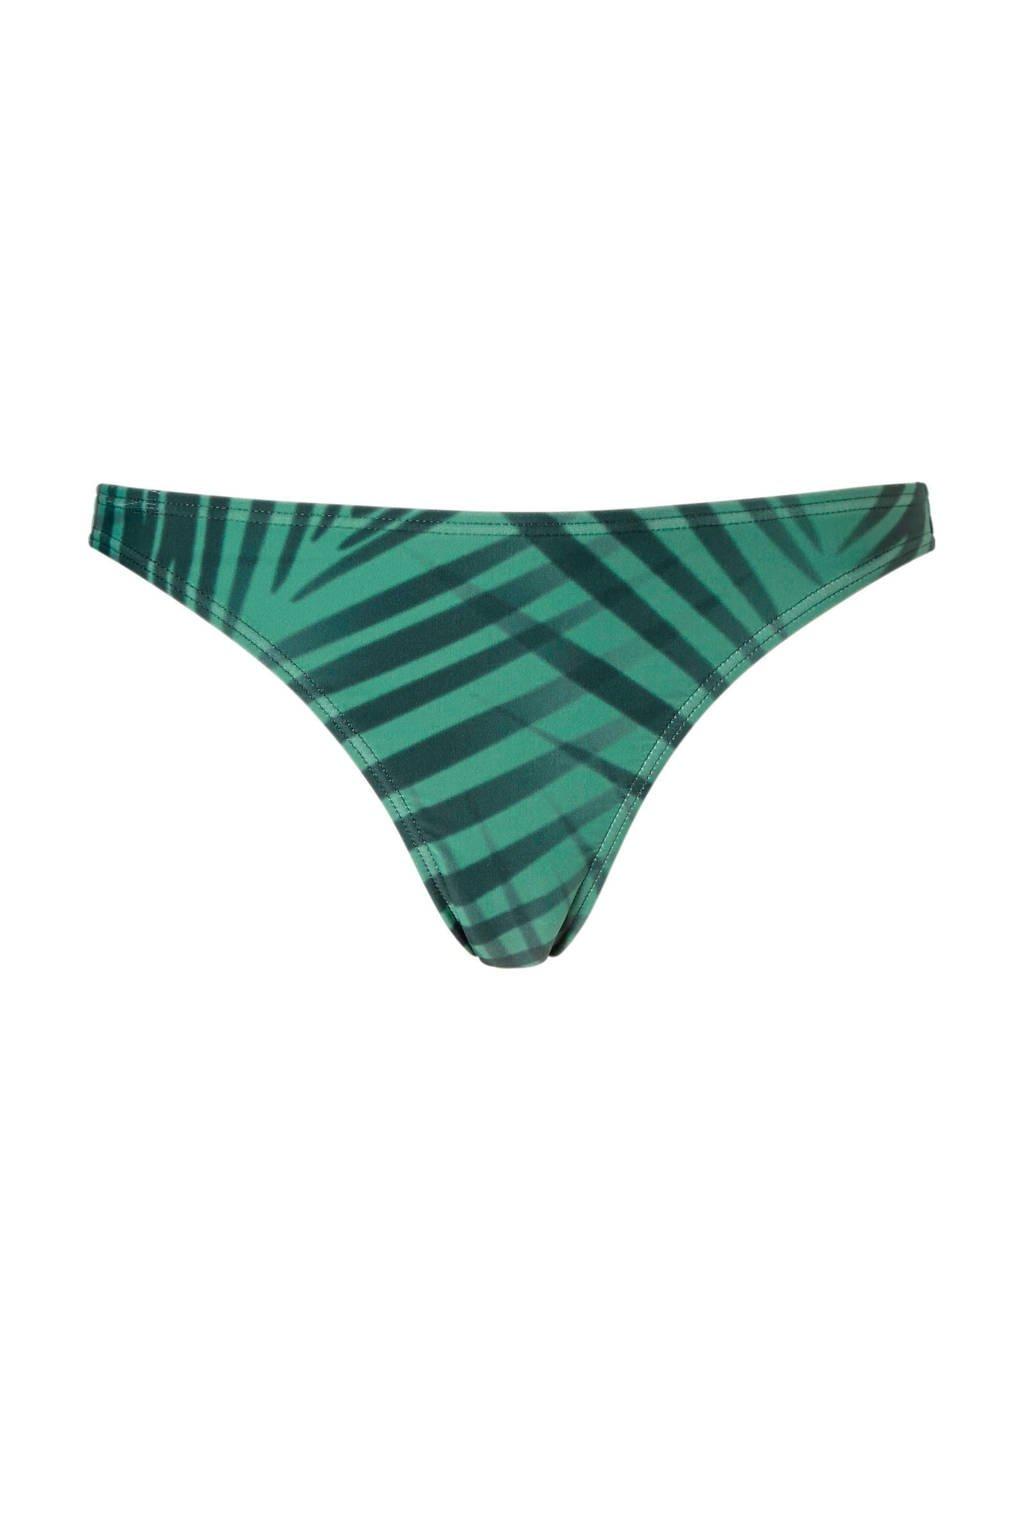 Broekje Een All In Groen Over Beachwavebikini Whkmp's Print 4pw6nx56